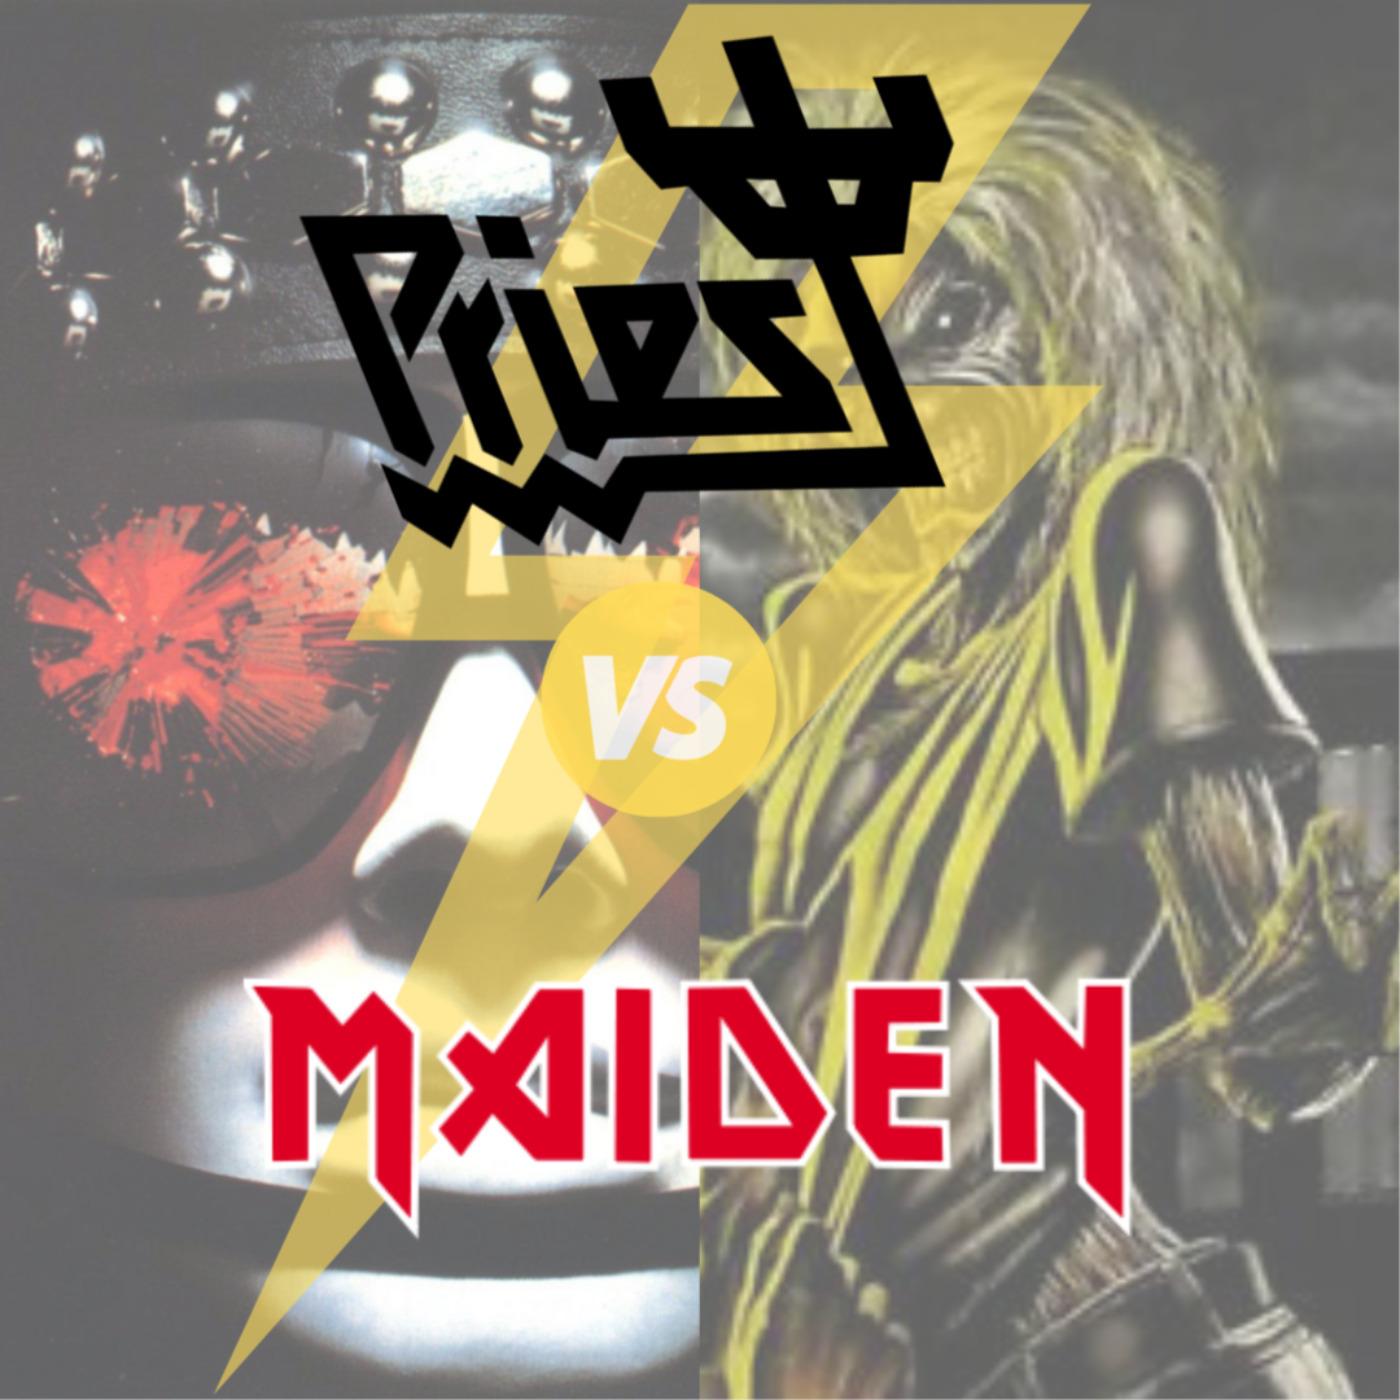 Priest VS Maiden